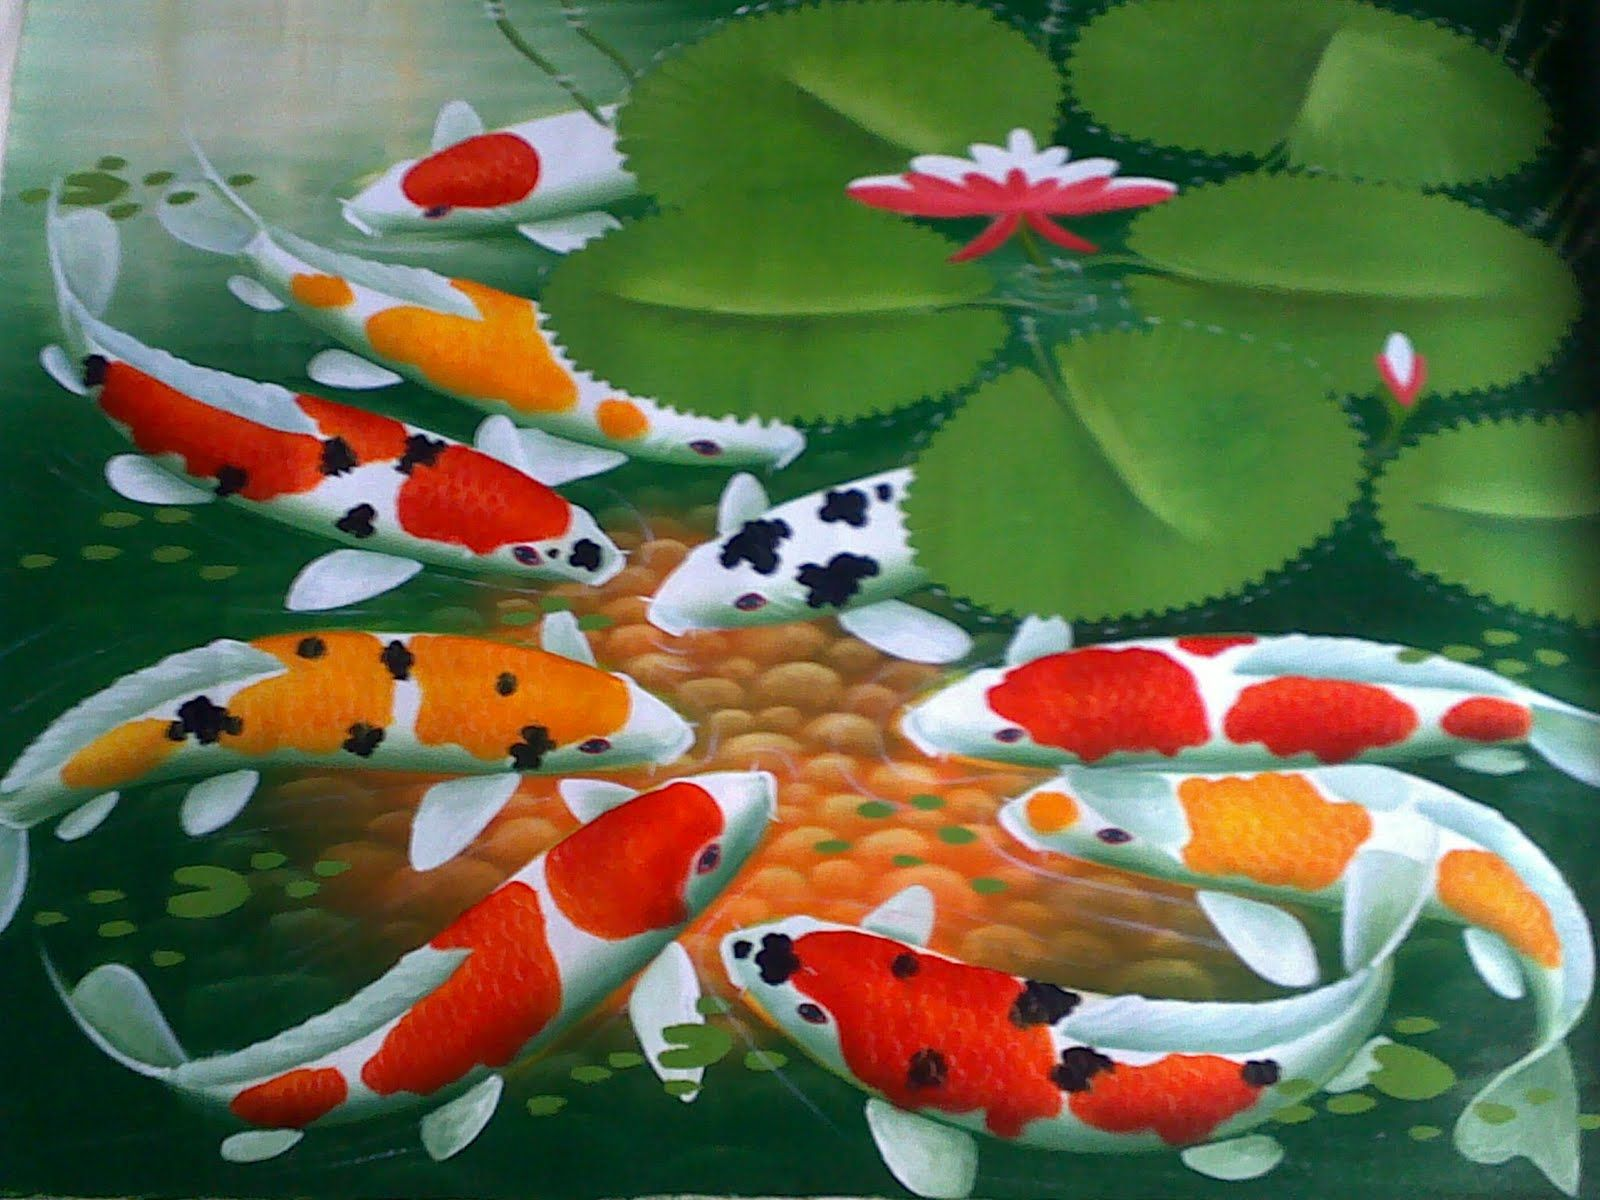 koi   koi fish on display was very interesting   ponds and fish ...